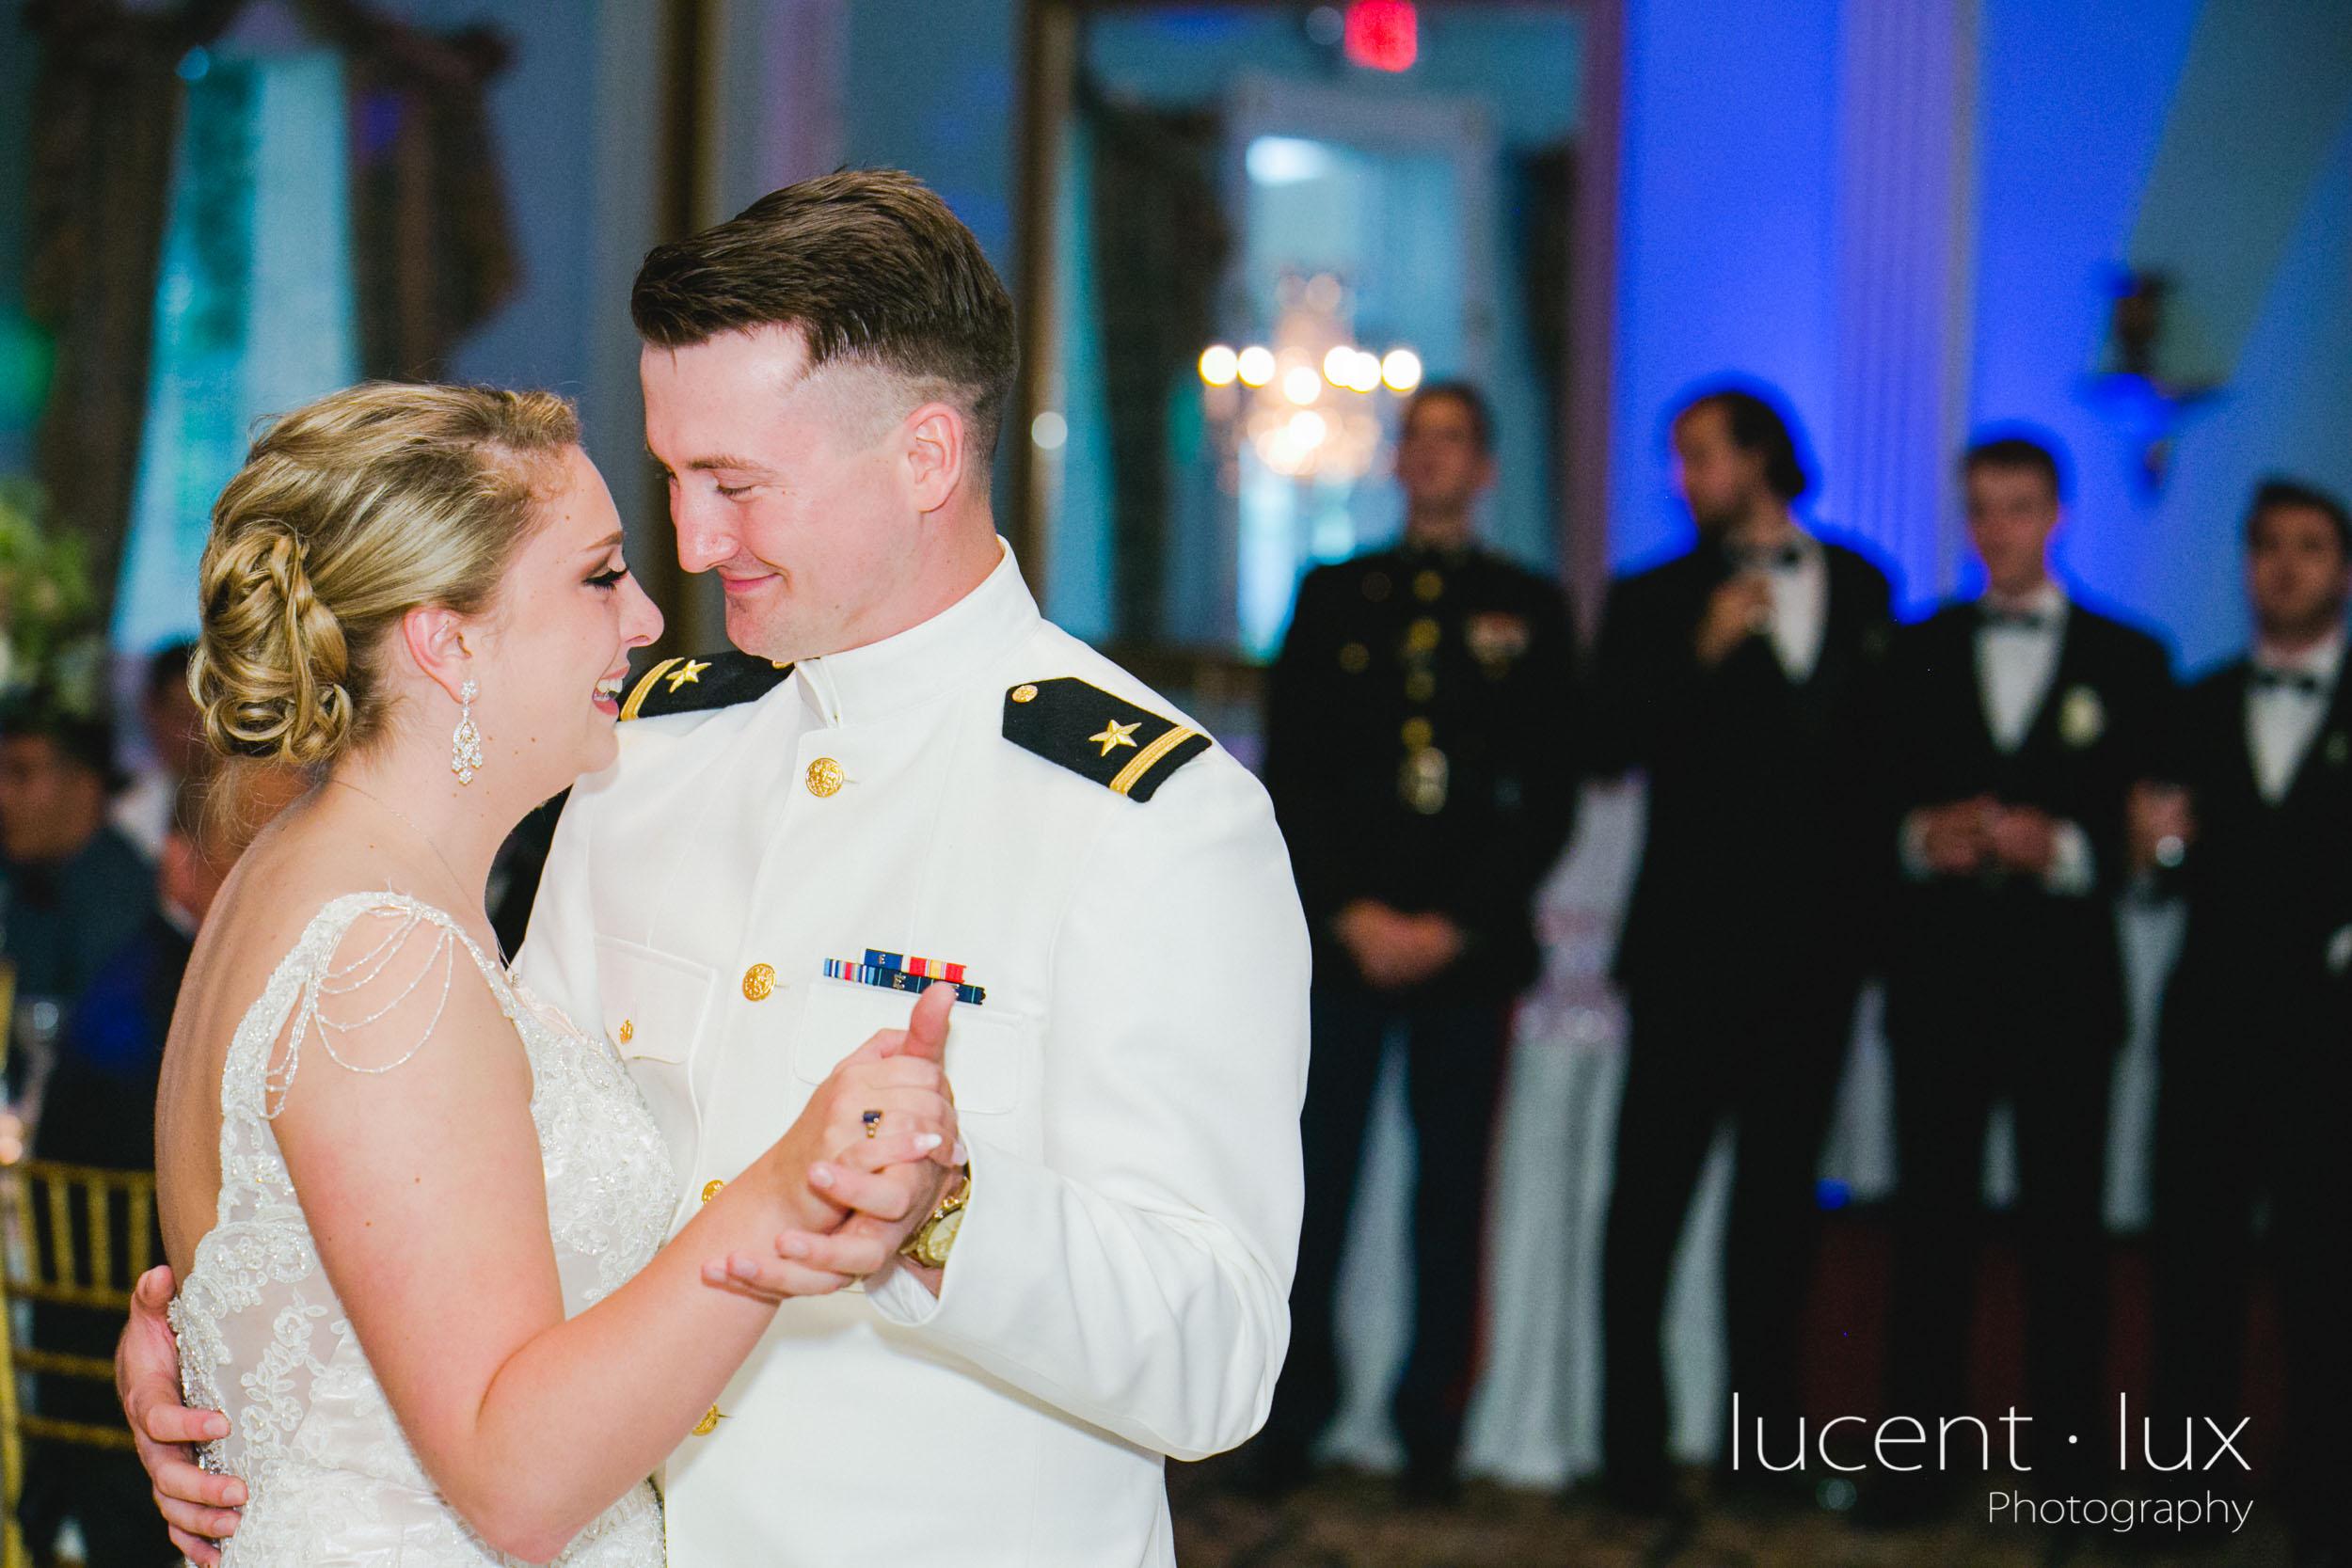 Wedding-Photography-Maryland-Pennsylvania-Photographer-Mendenhall-Inn-Media-Portrait-Event-151.jpg